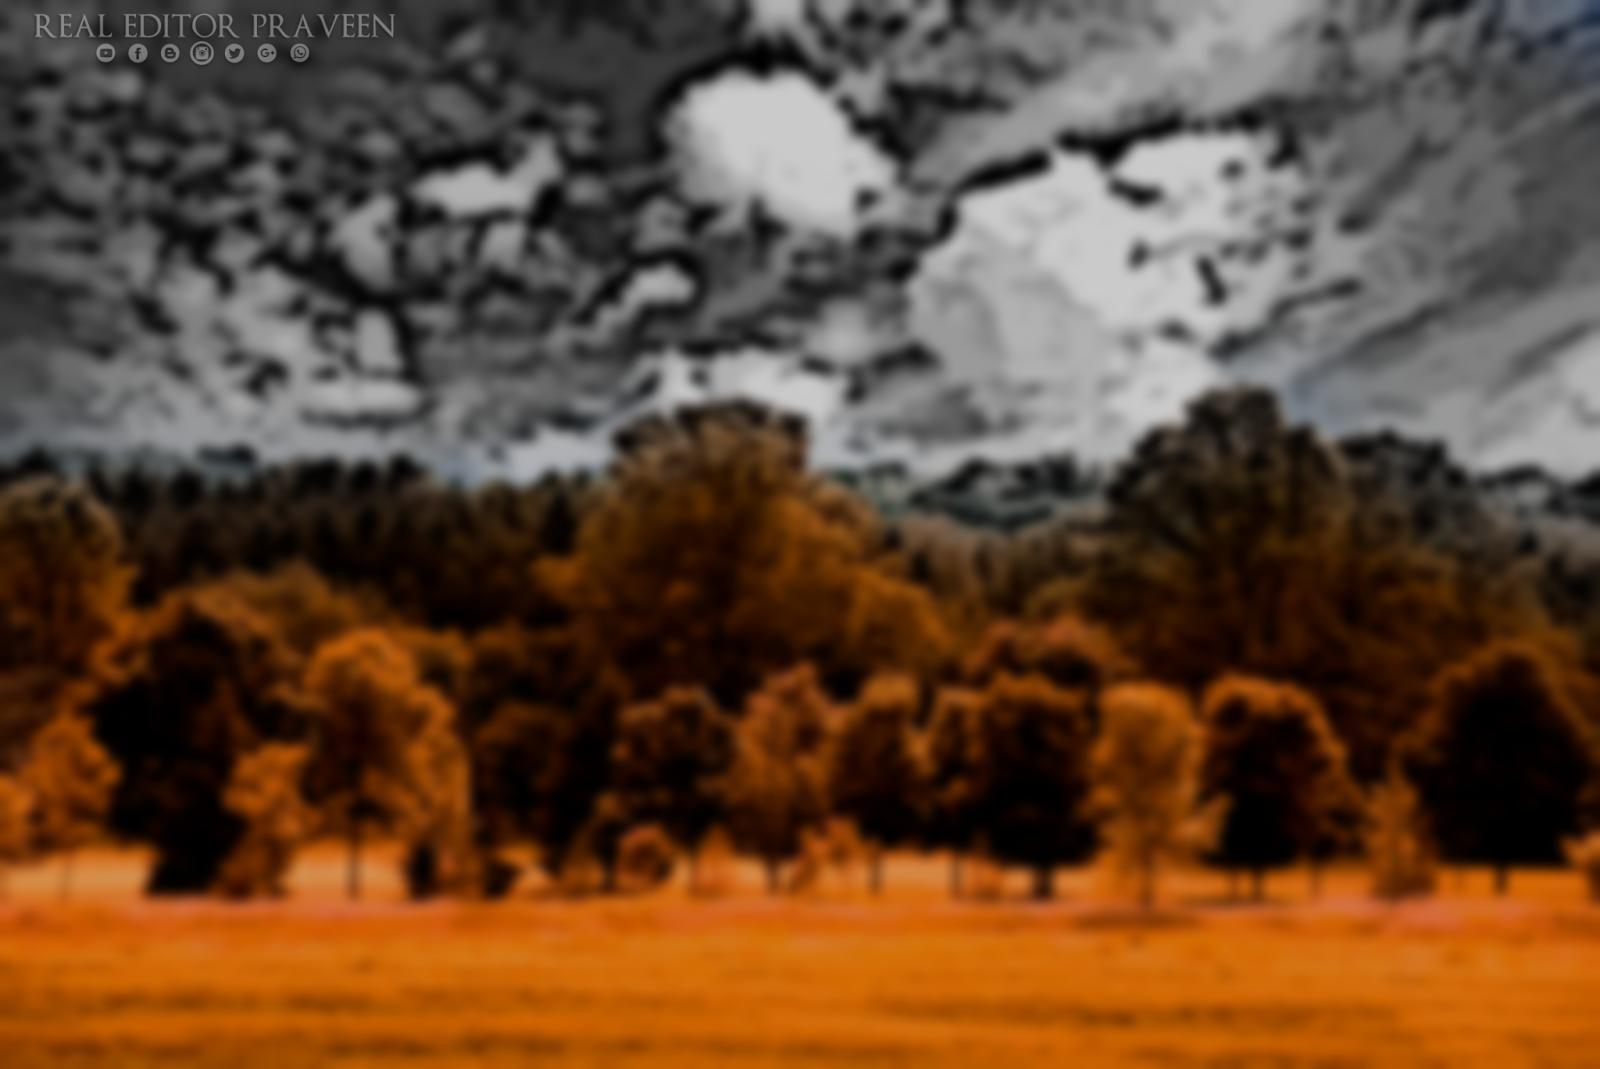 New Cb Backgrounds Download 50 Picsart Cb Editing: CB EDITS BACKGROUND ULTRA HD